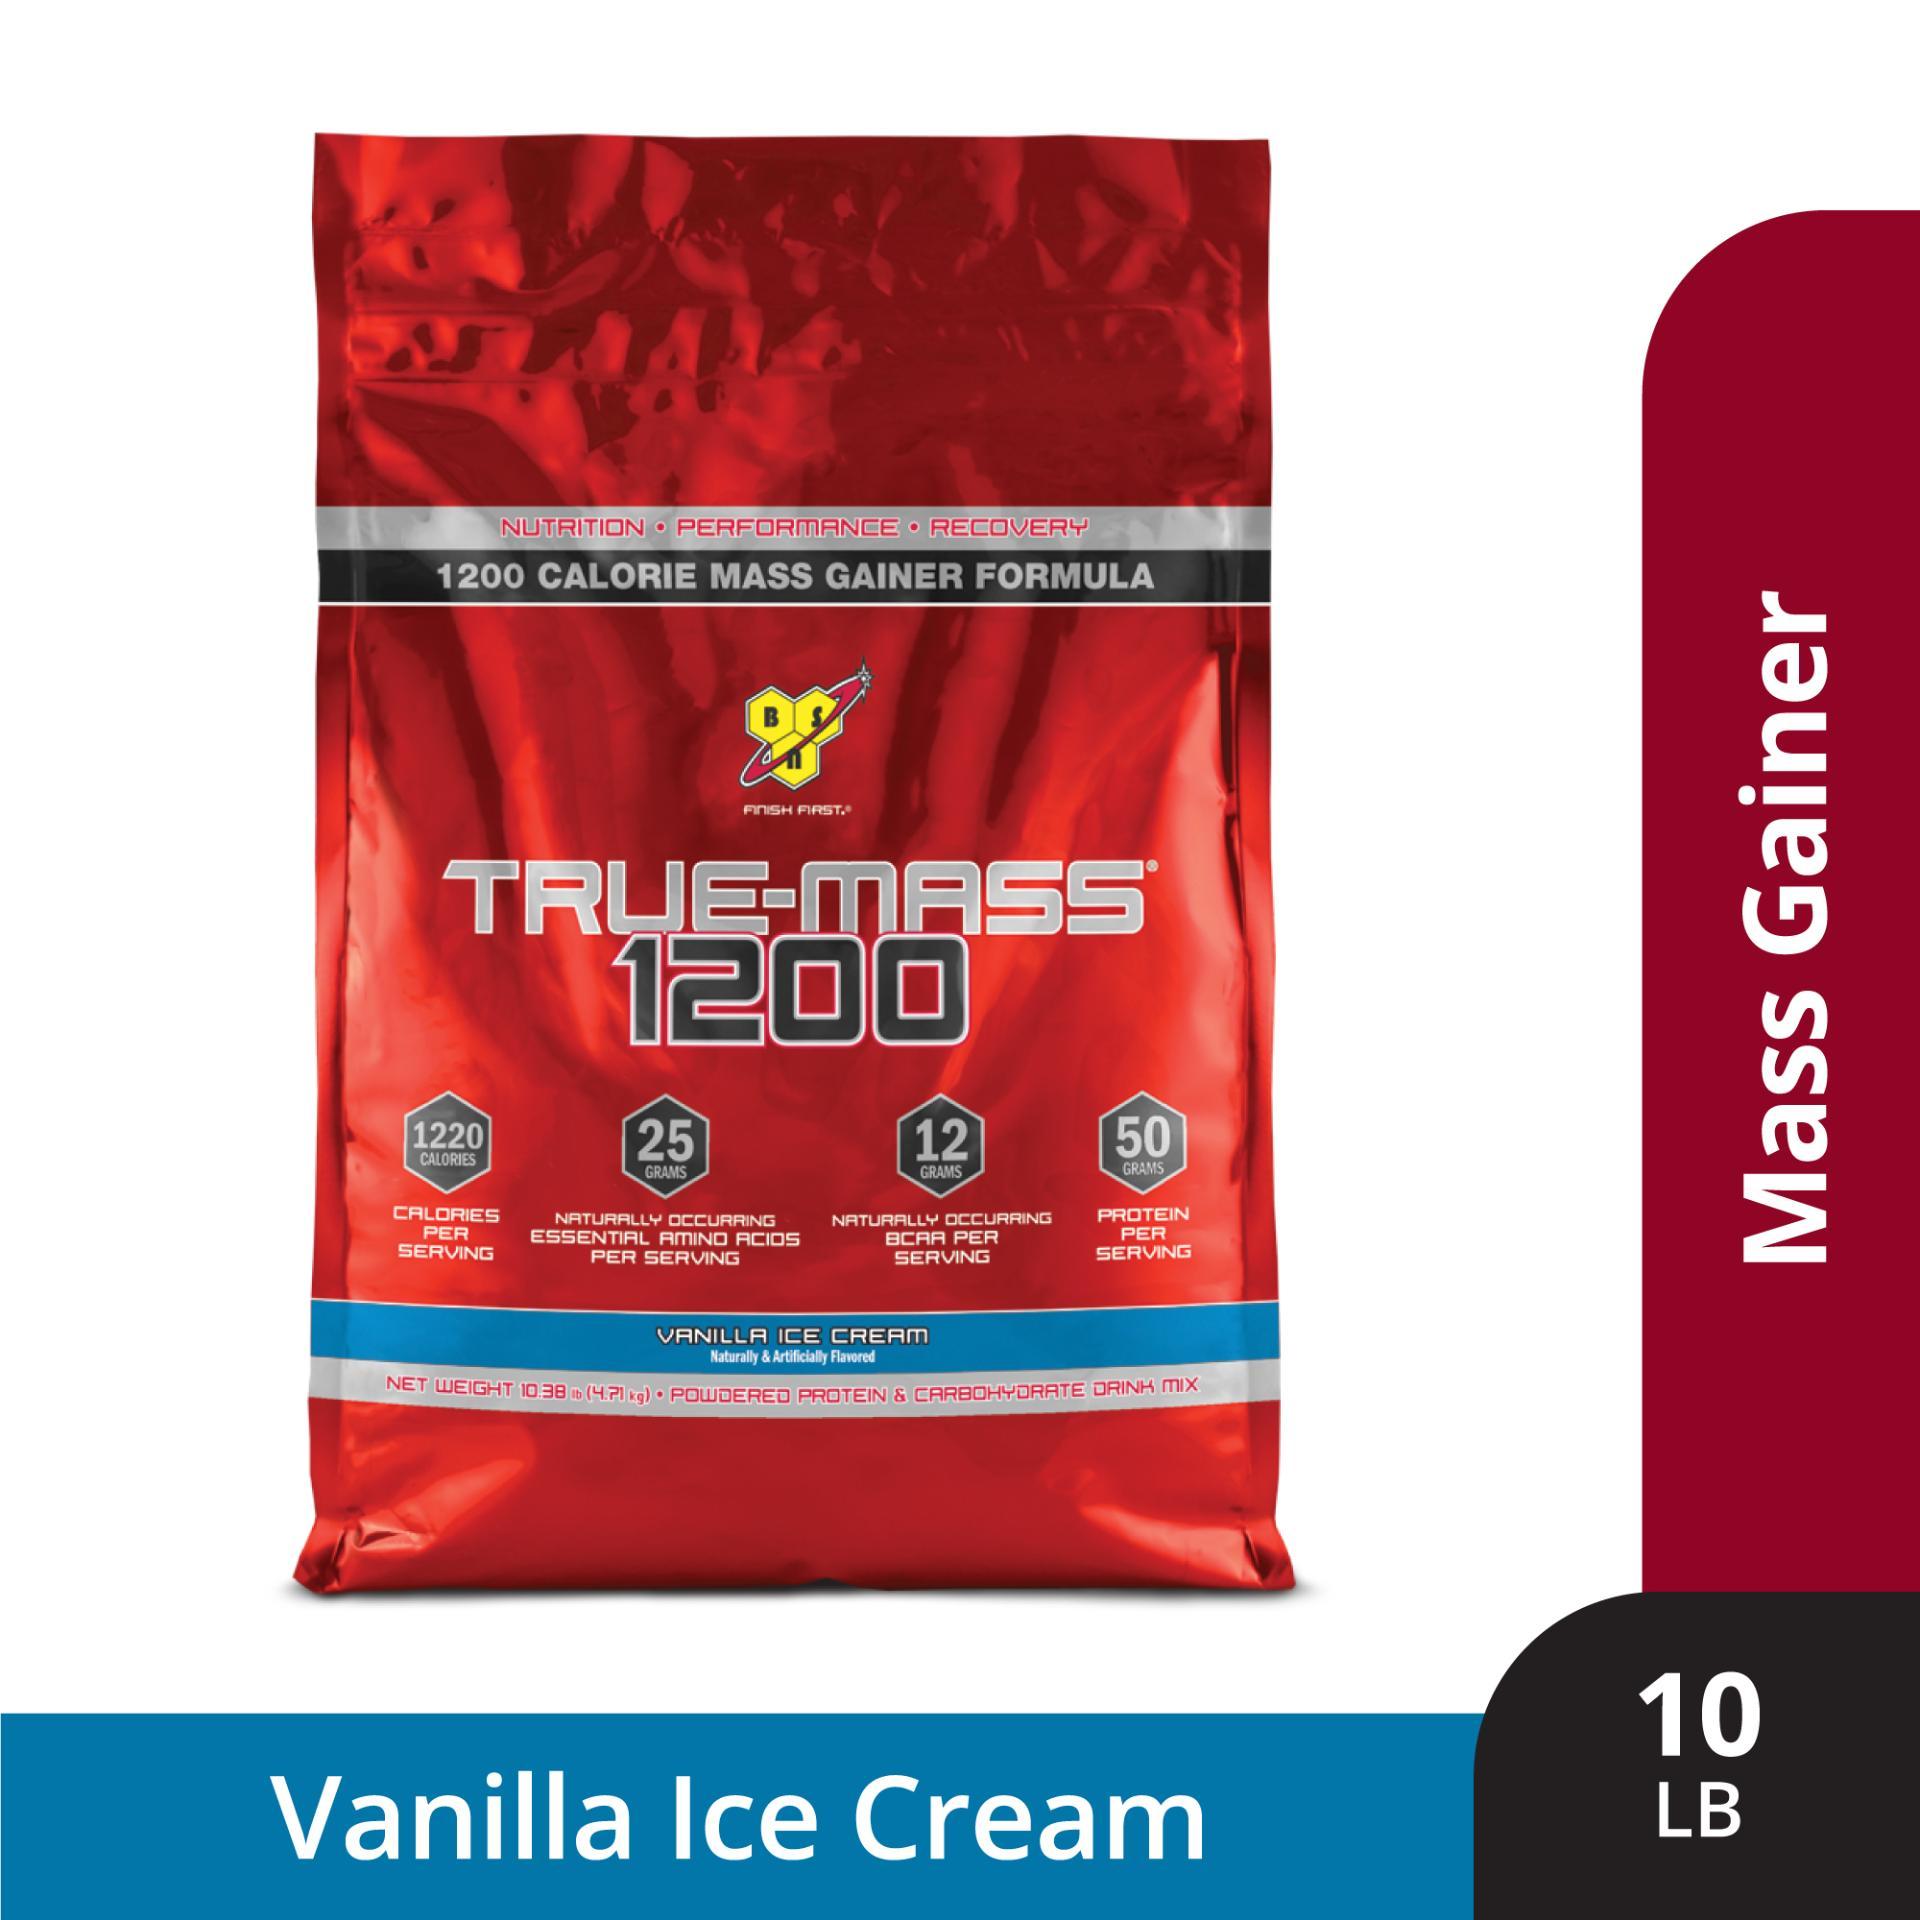 Thực phẩm bổ sungTrue Mass 1200 Vanilla Ice Cream10 lbs nhập khẩu